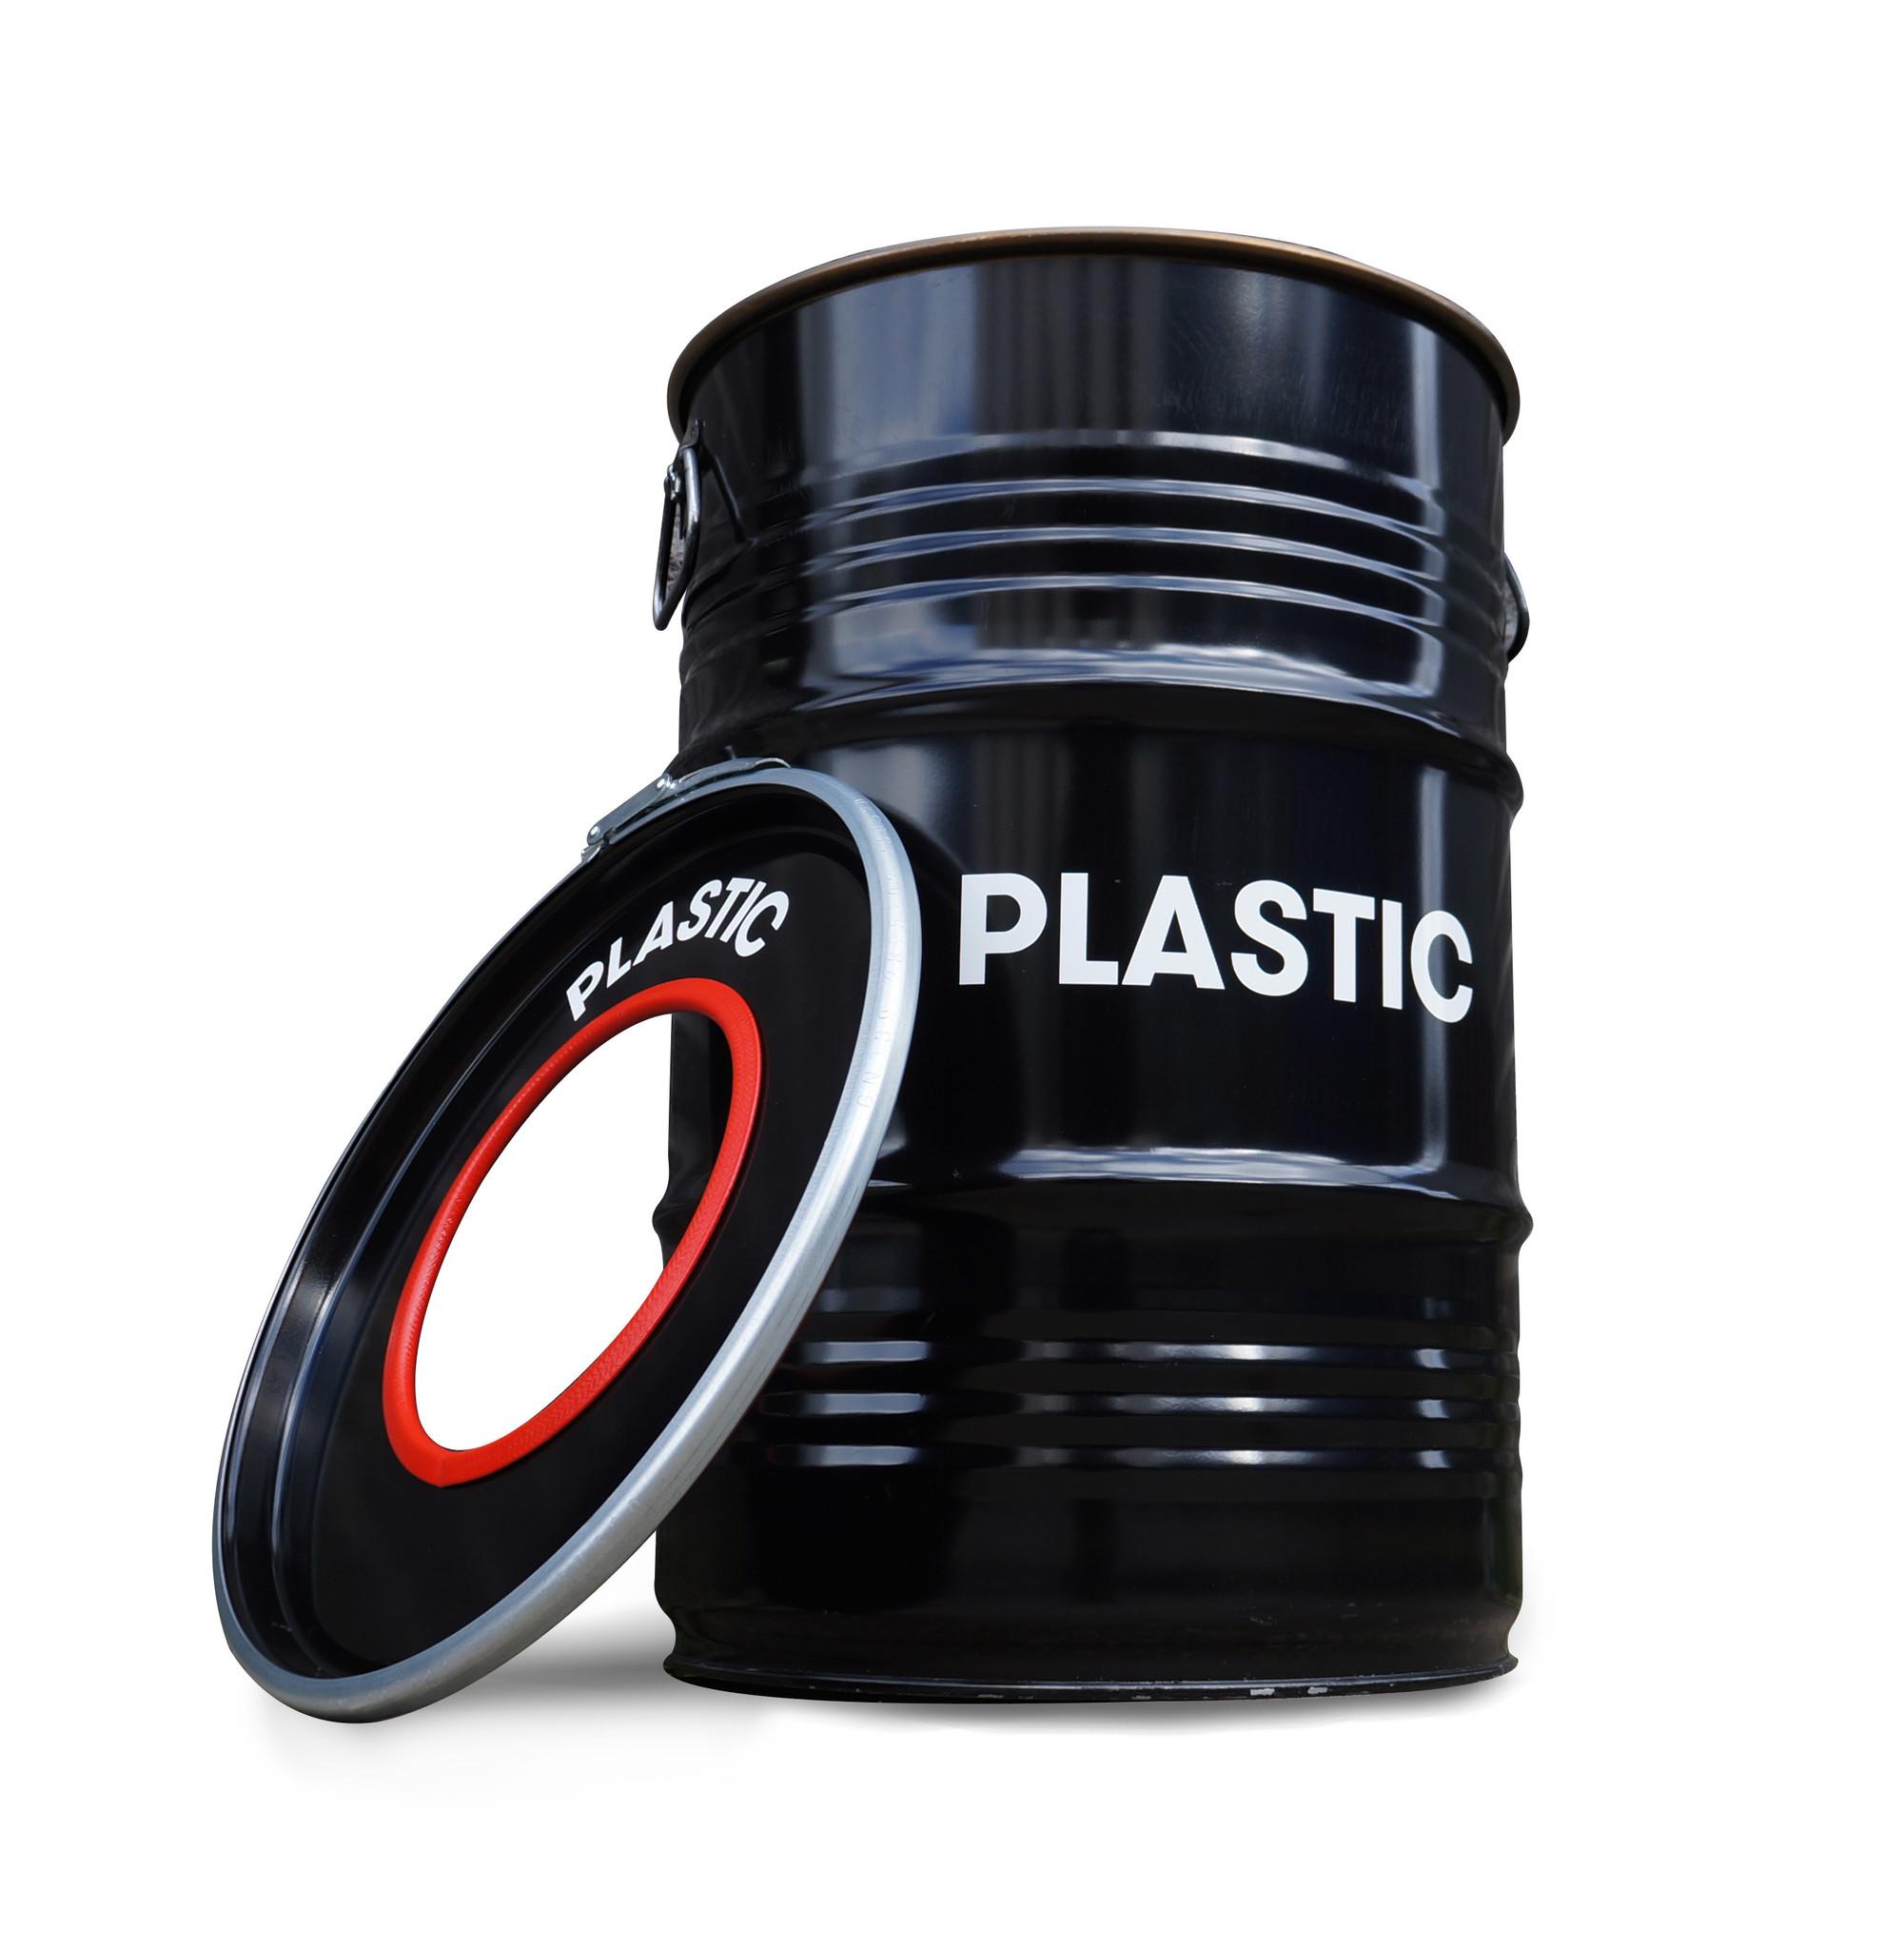 Barrelkings BinBin Hole Plastic industrile prullenbak afvalscheiding 60 Liter